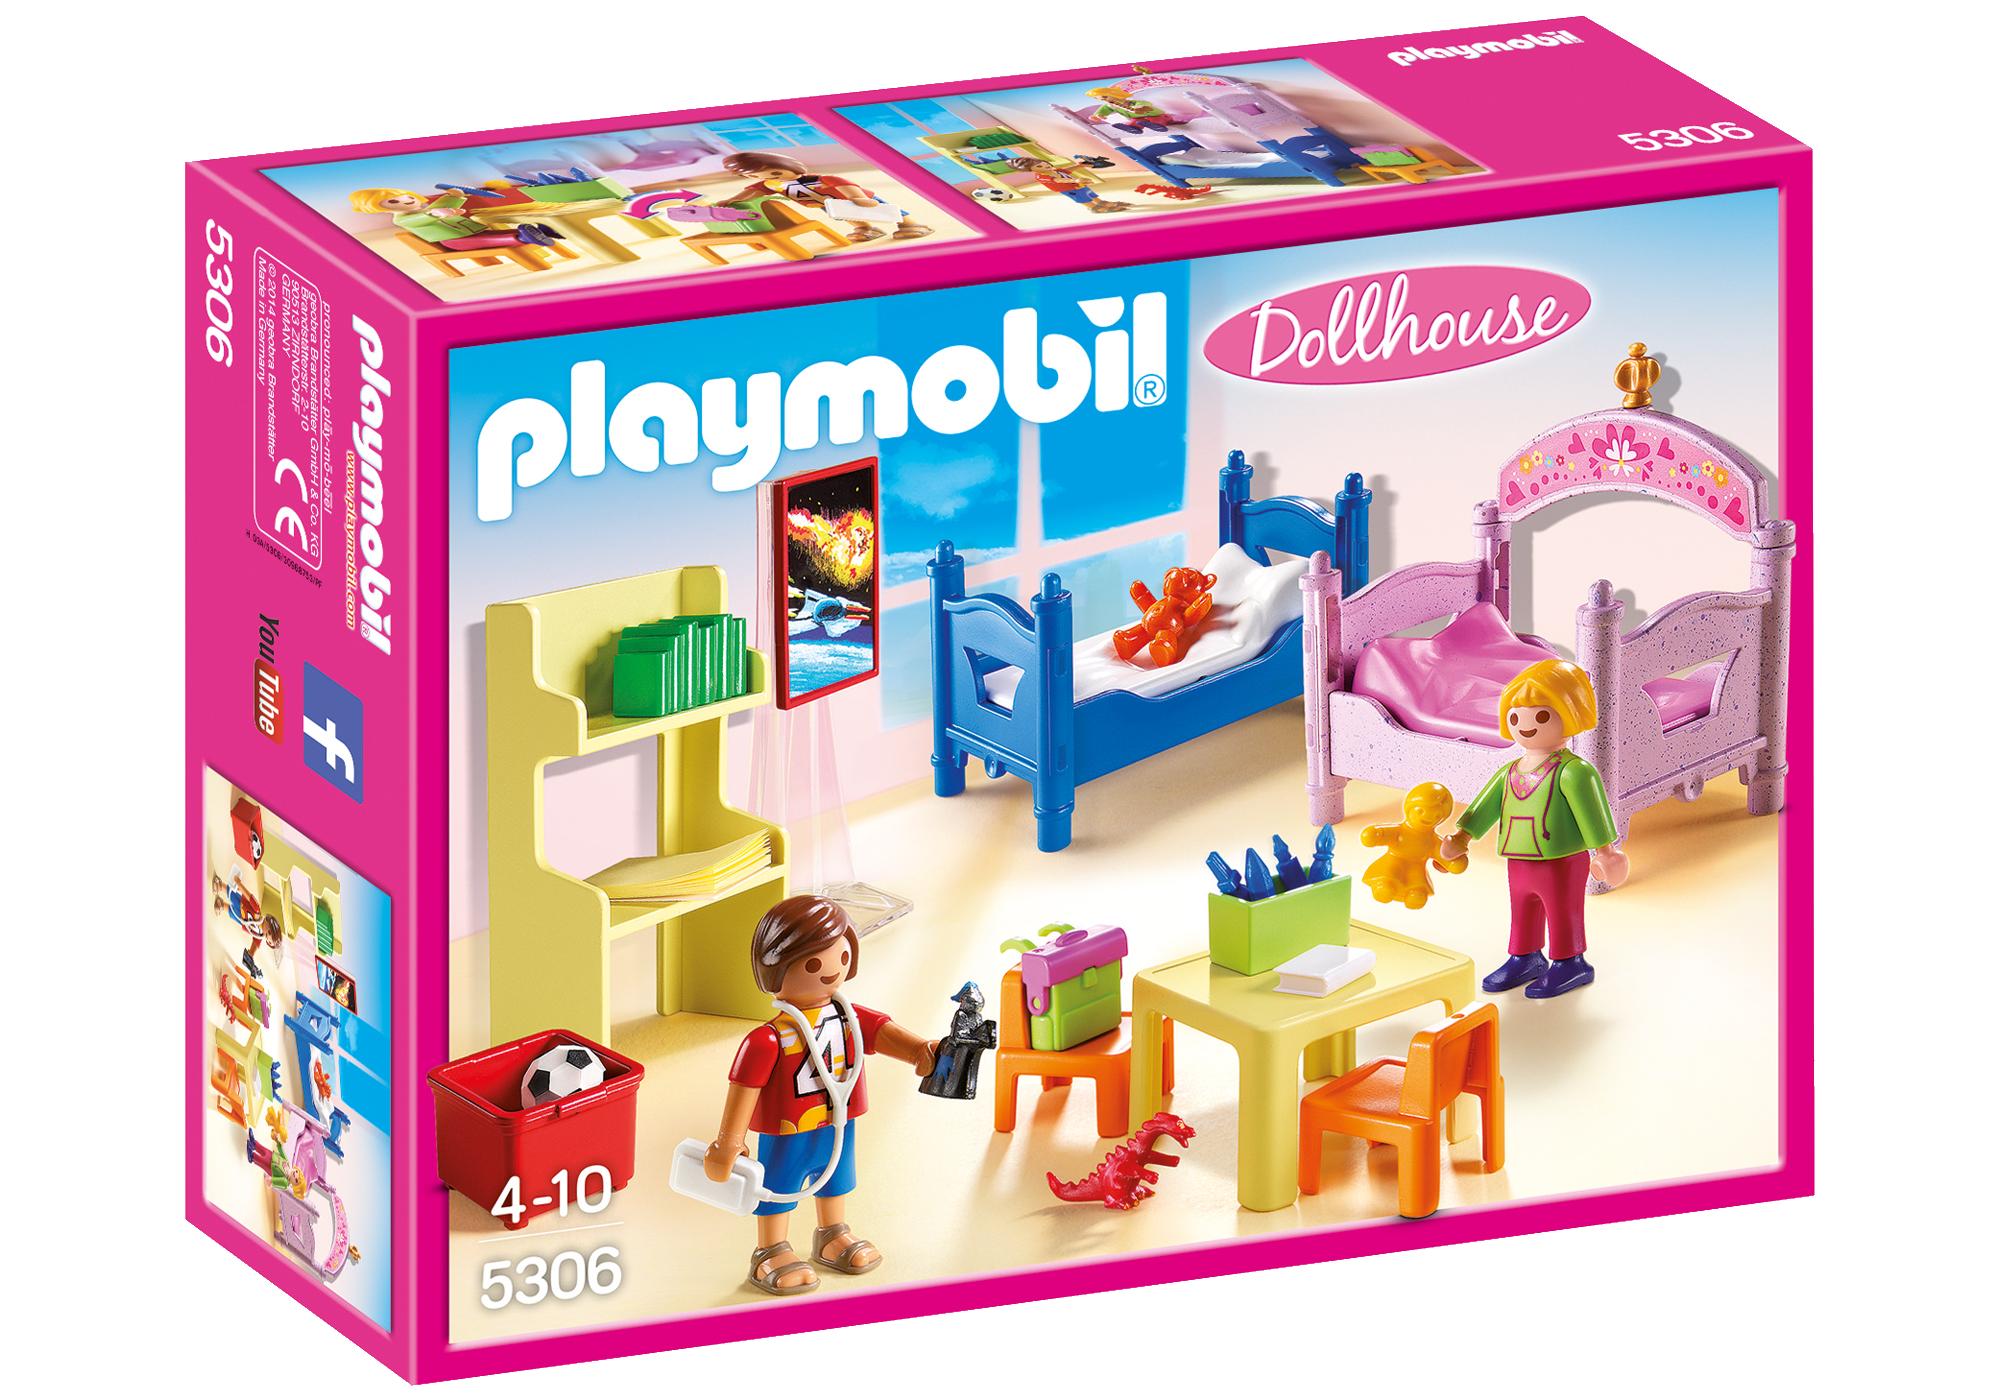 http://media.playmobil.com/i/playmobil/5306_product_box_front